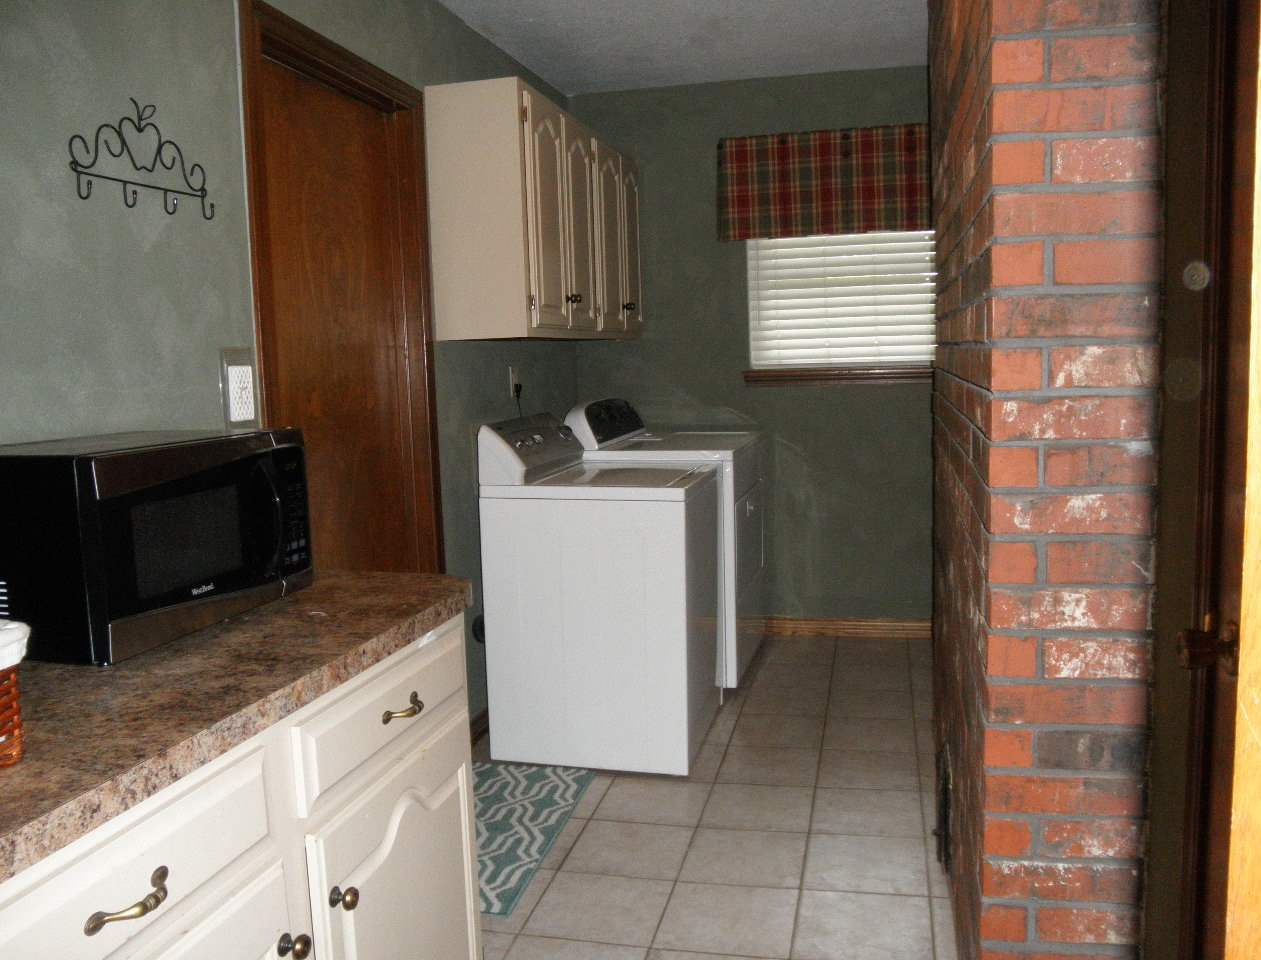 Sold Cross Sale W/ MLS | 2805 Ames  Ponca City, OK  22